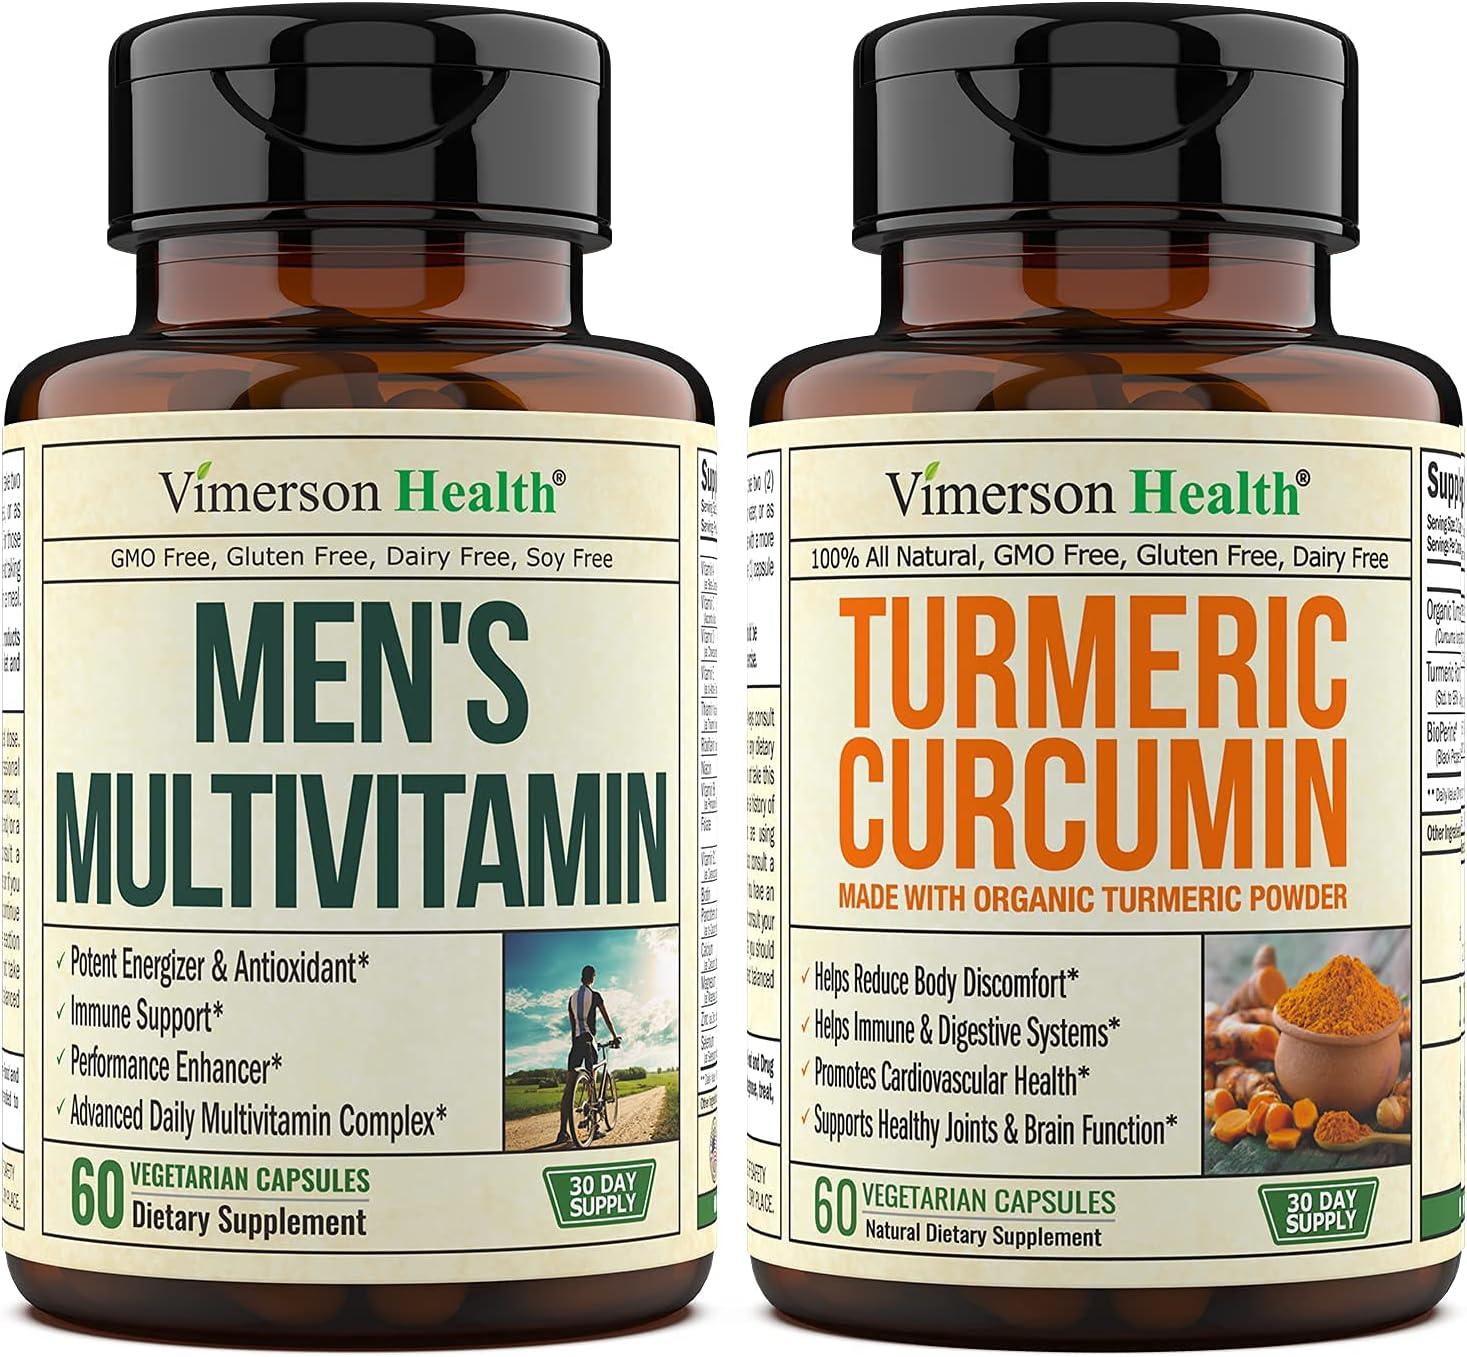 Vimerson Health New York Mall Men's Multivitamin + Turmeric High quality new BioPe with Organic